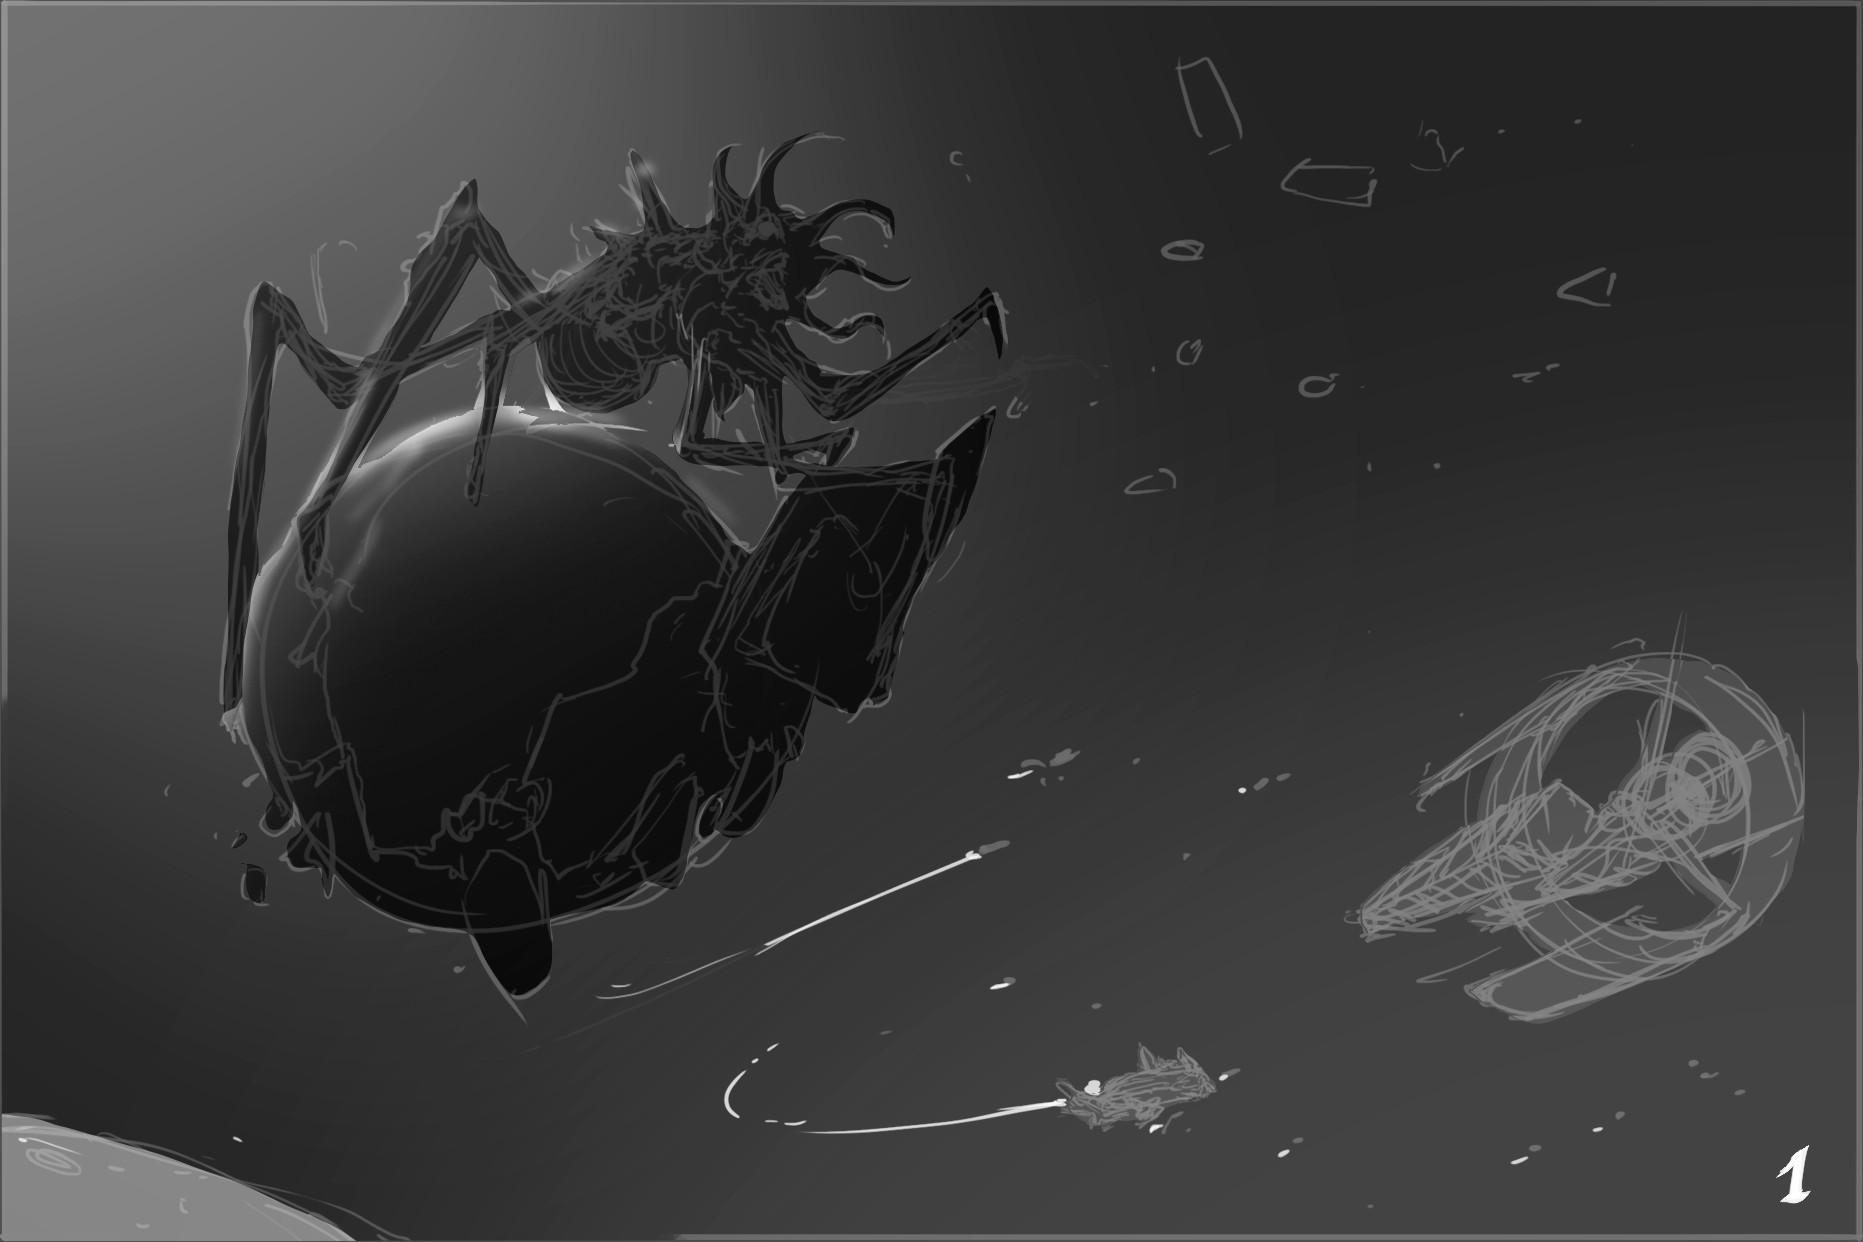 Kaithzer morejon matanga terror espacial 0000 capa 10